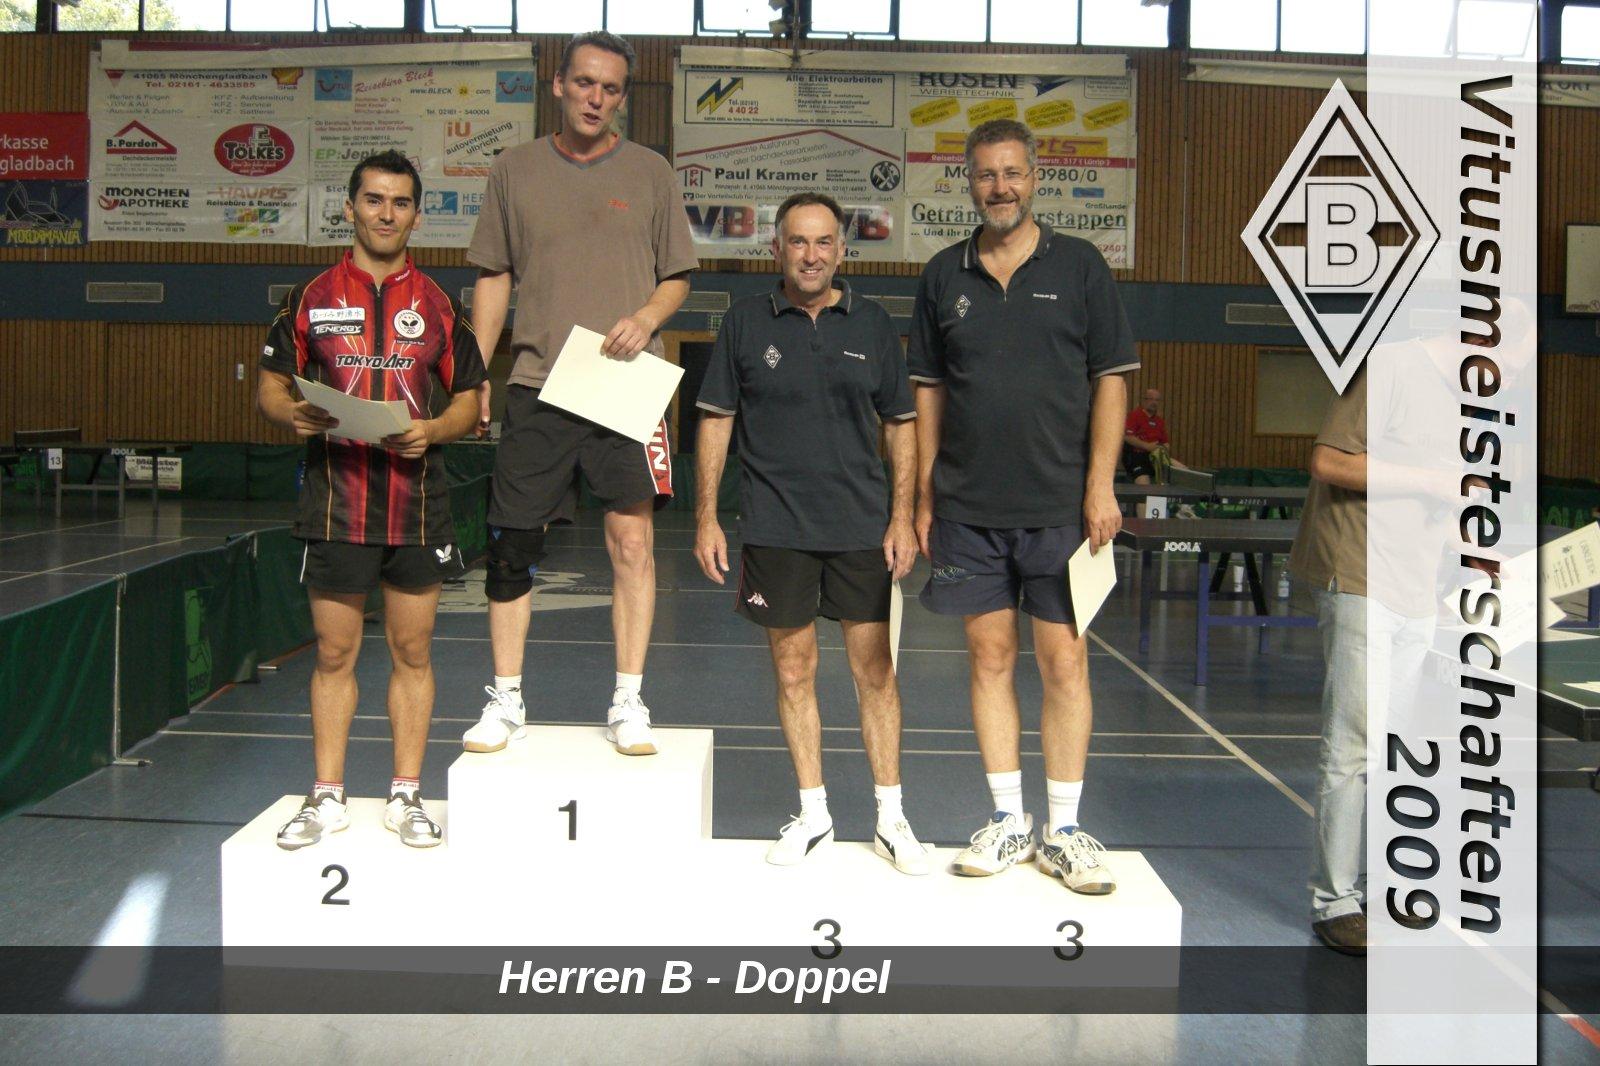 VM2009-HerrenB-Doppel